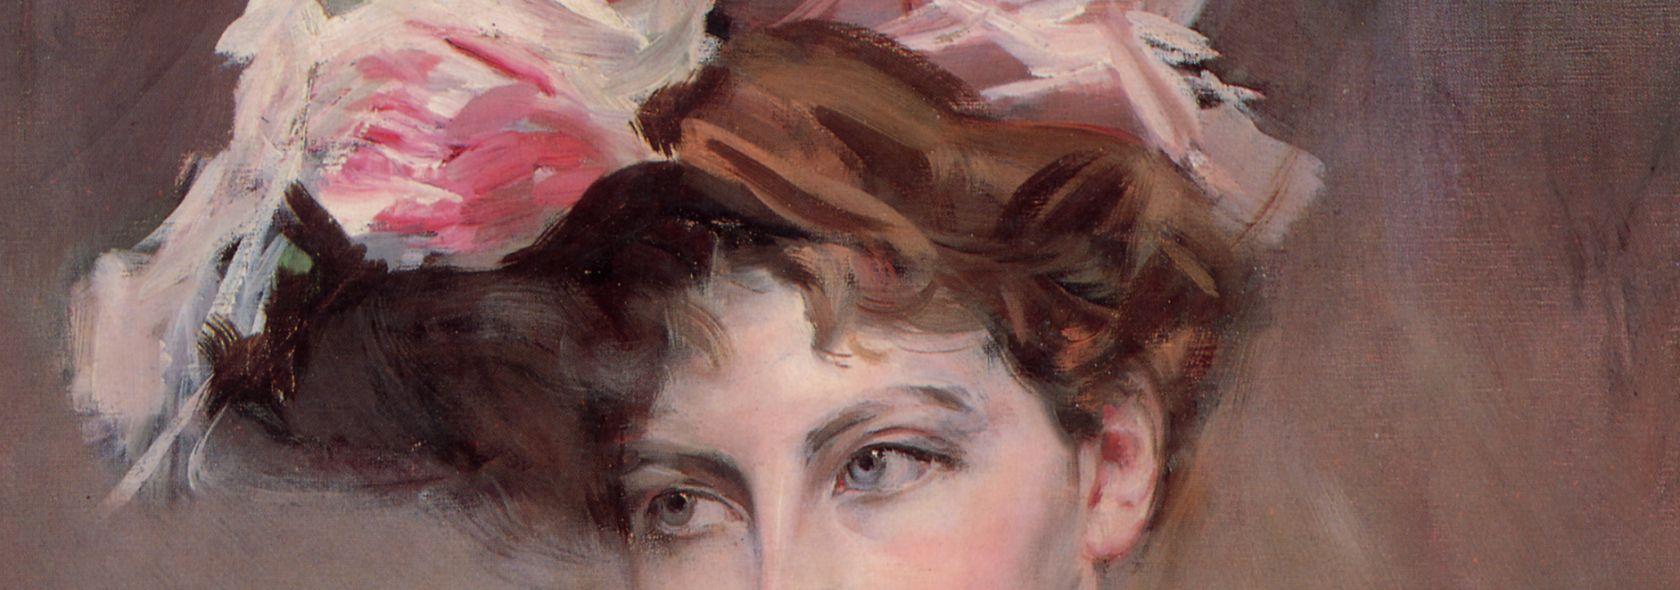 Giovanni Boldini - La contessa Beatrice van Bylandt -1901 - DOCSAI - ©ArchFotoGE